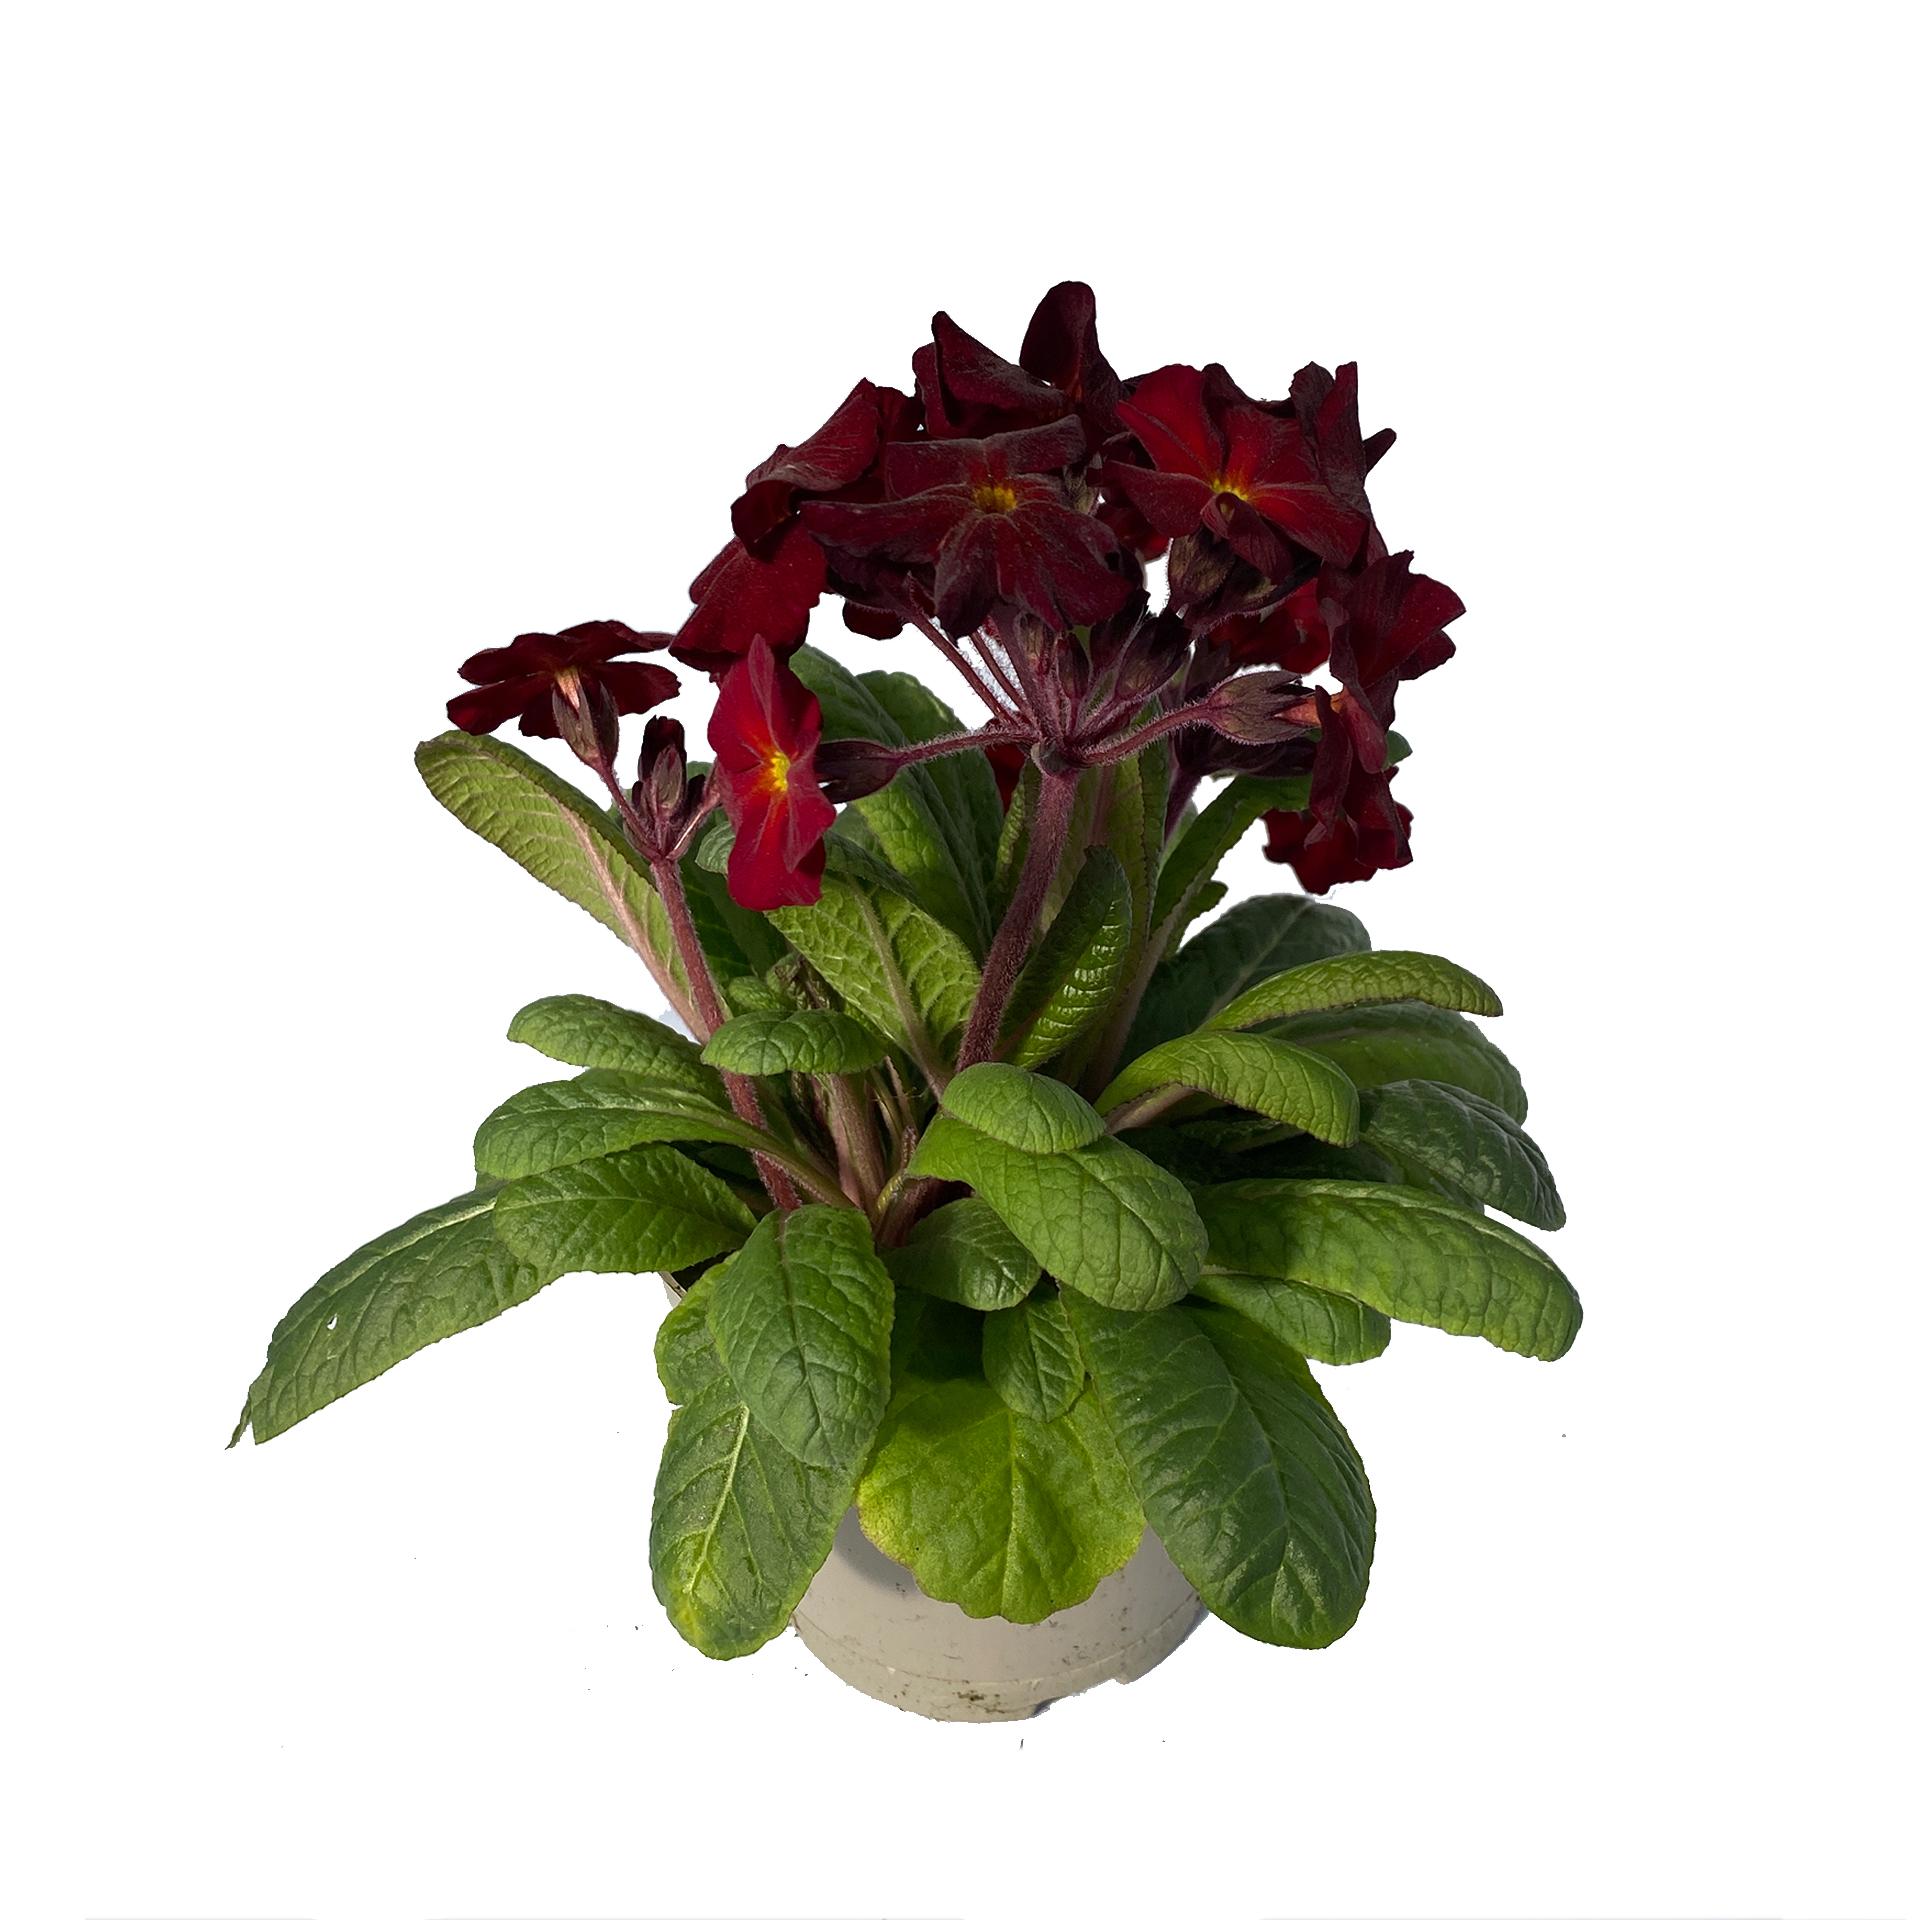 Hohe Schlüsselblume - Primula elatior, rot, 12cm Topf